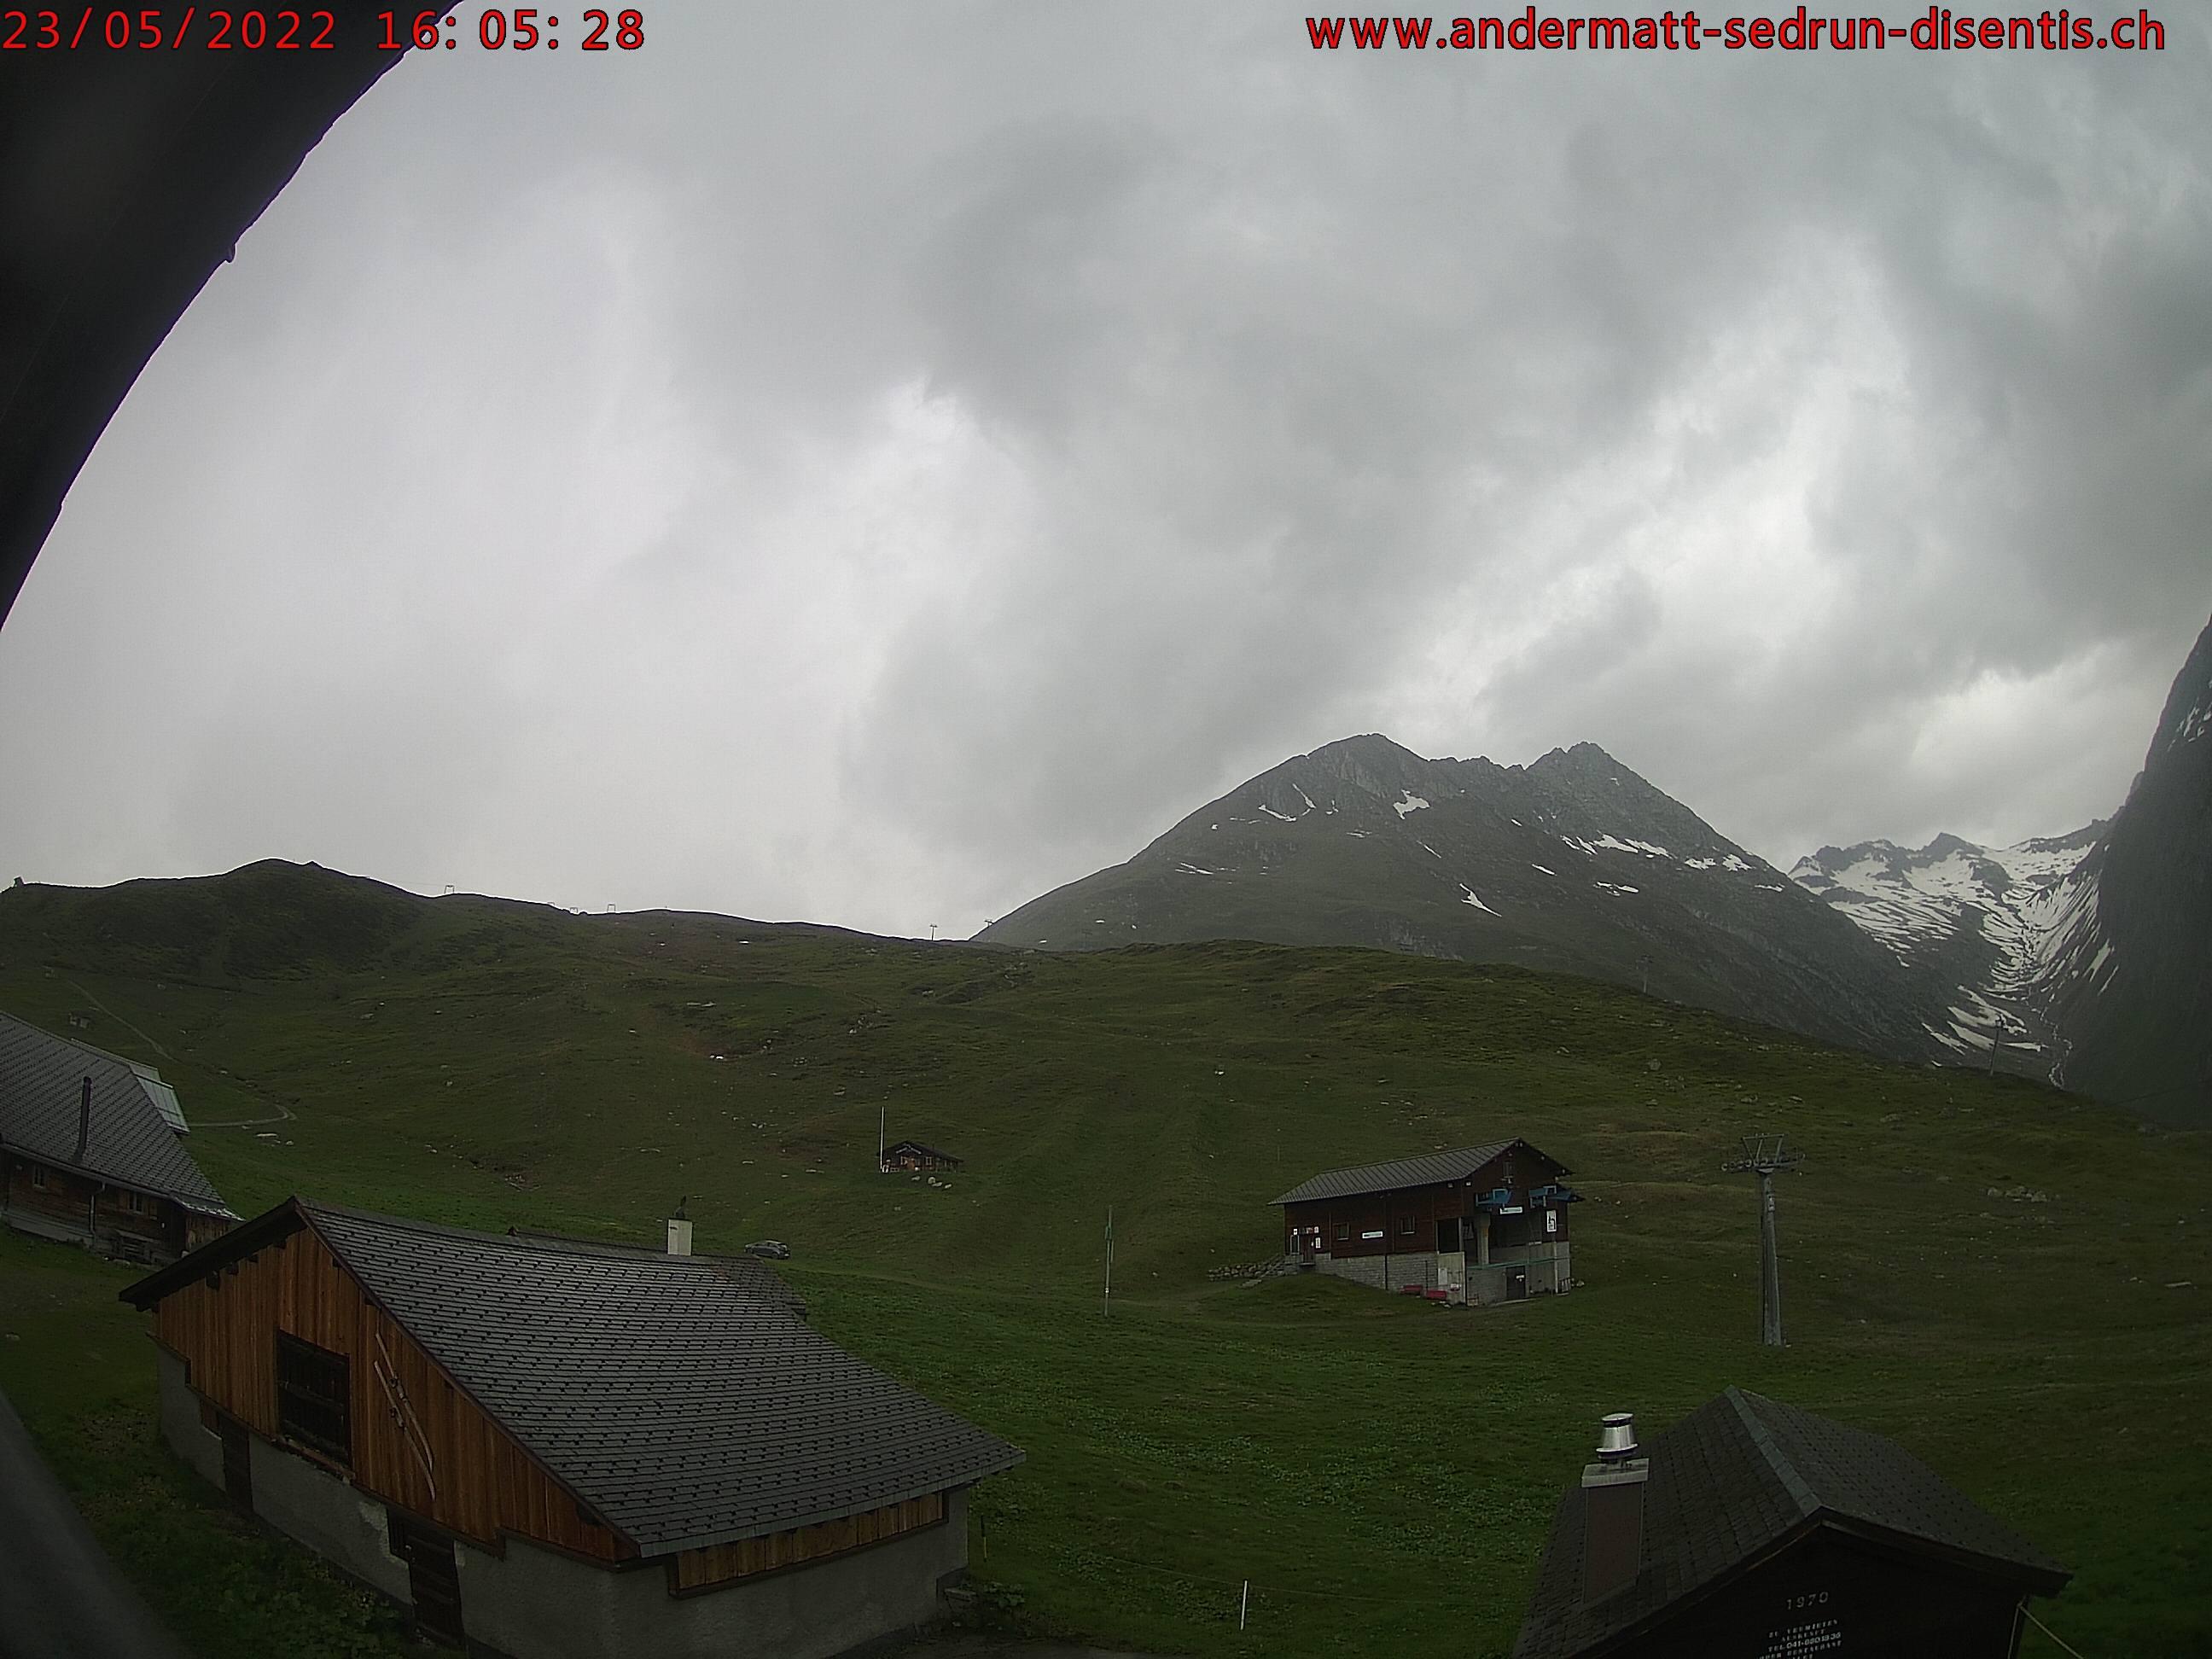 Bergstation Milez, Sedrun